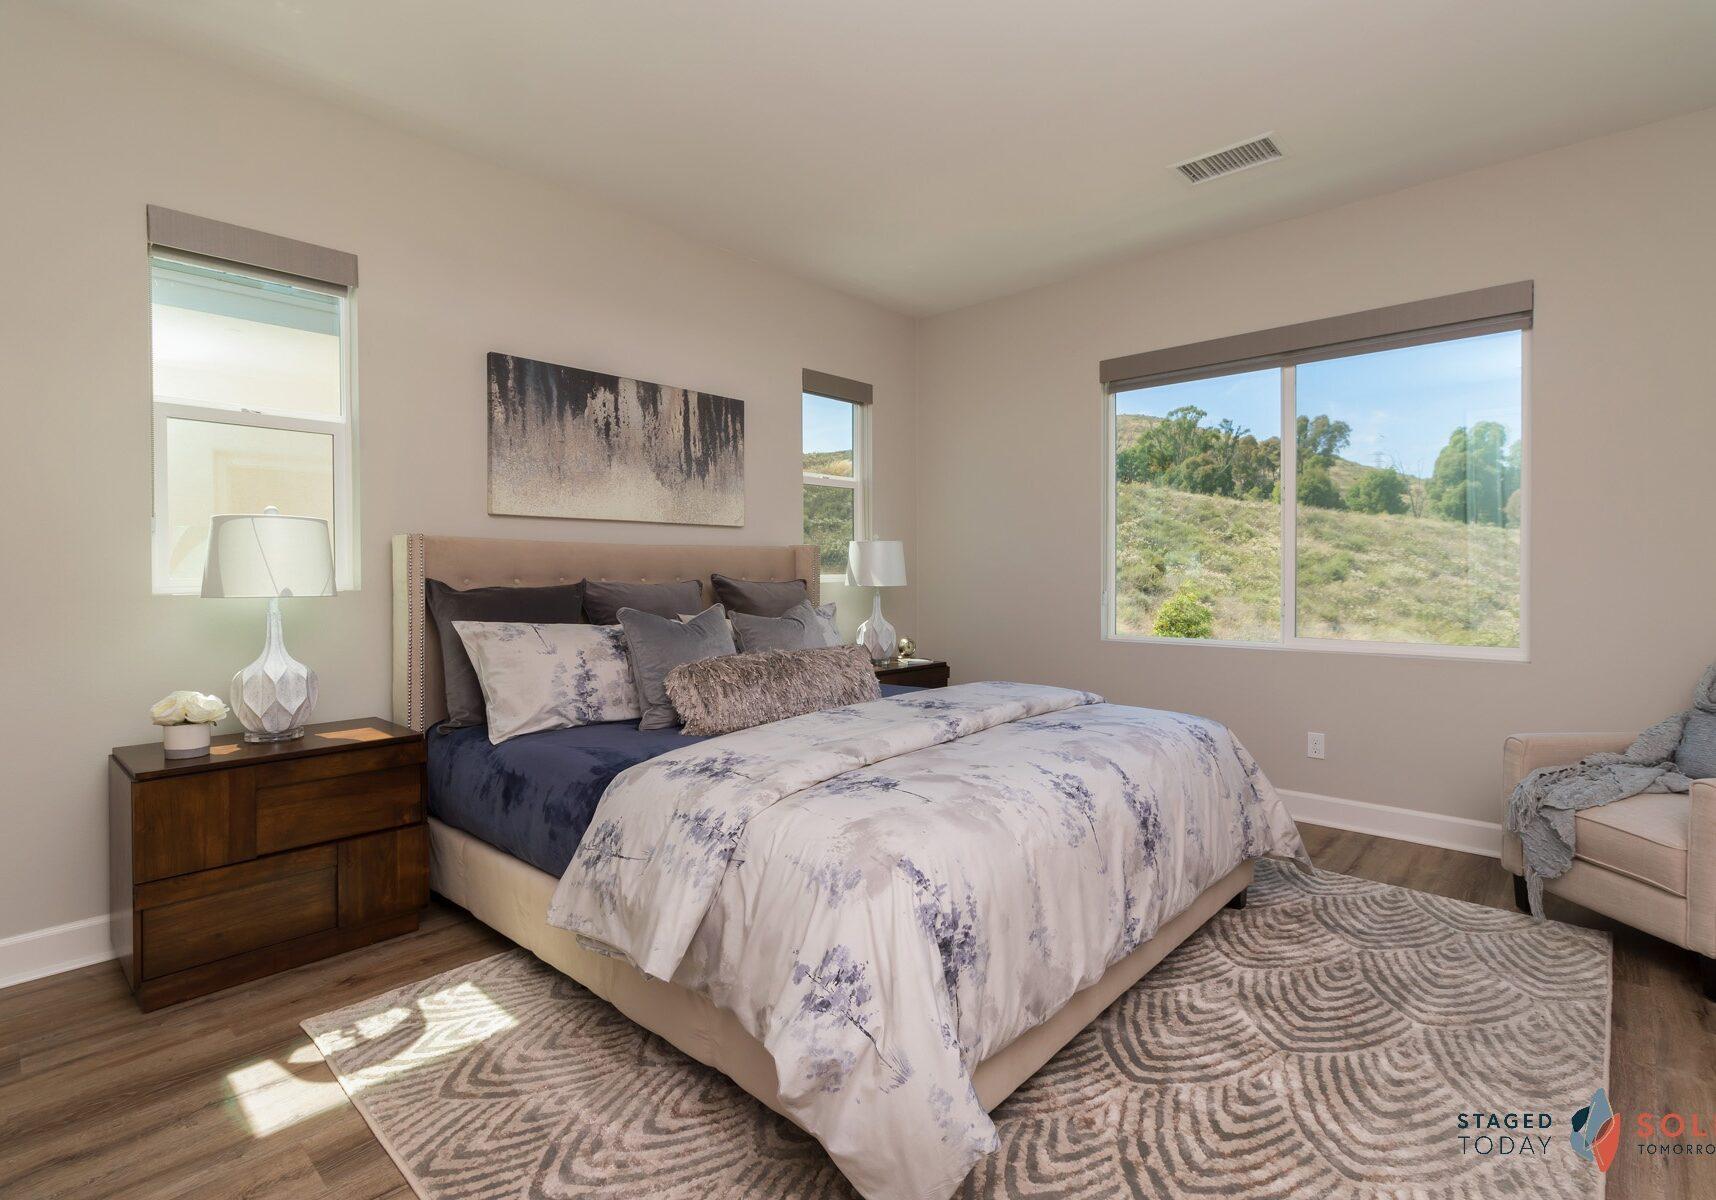 8b - Chaparral Way - Santee - Master Bedroom - After